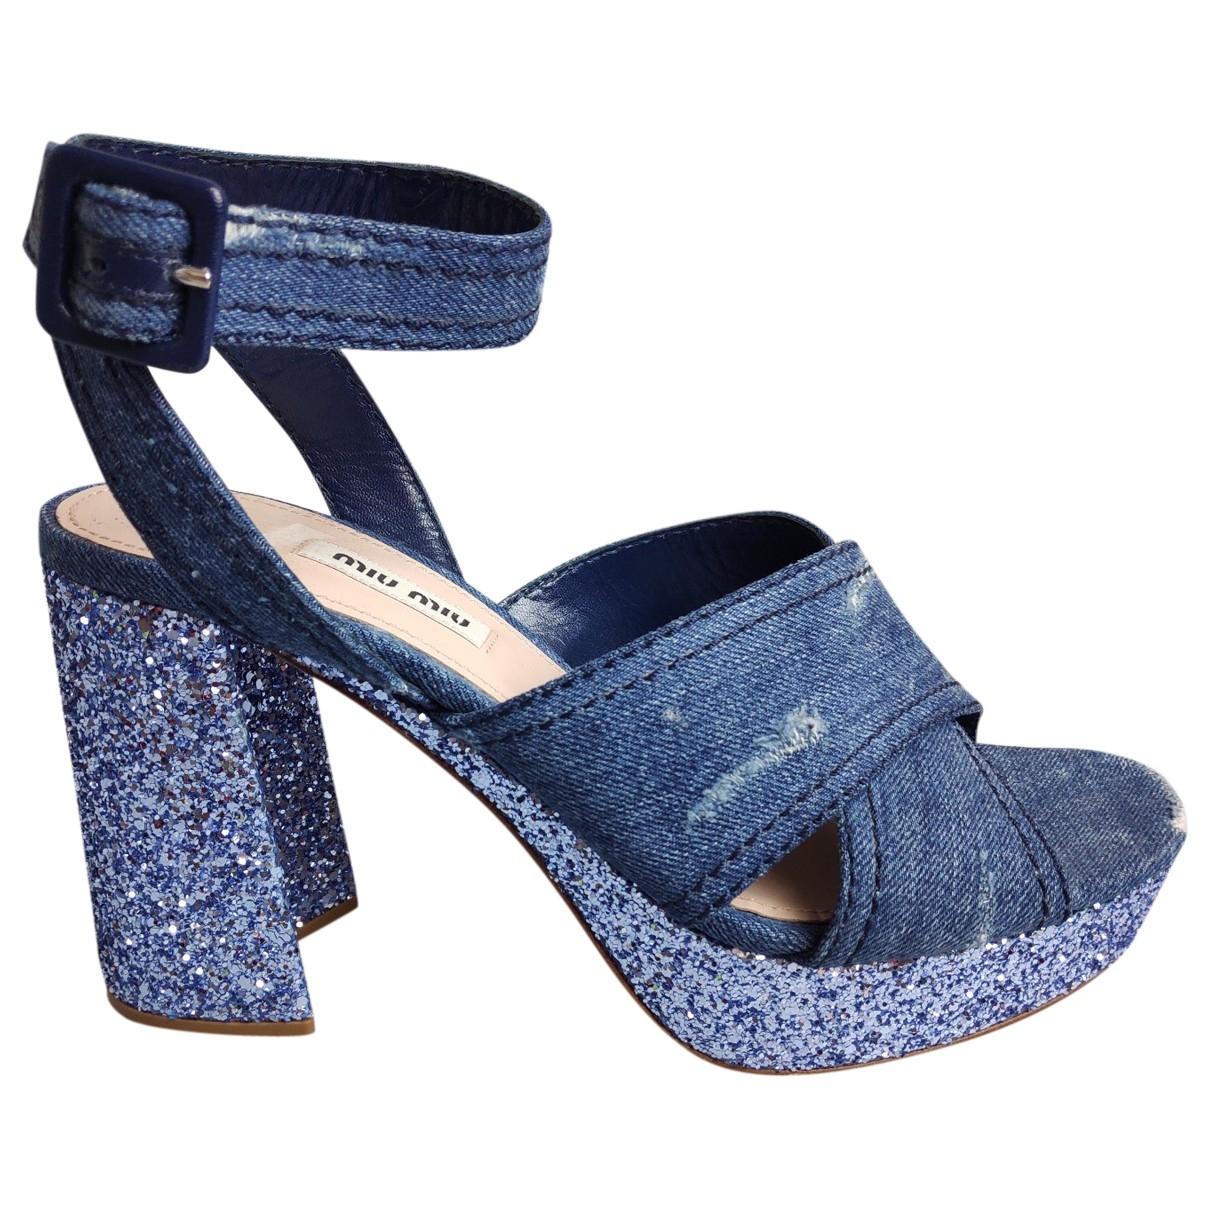 Miu Miu \N Sandalen in  Blau Leinen